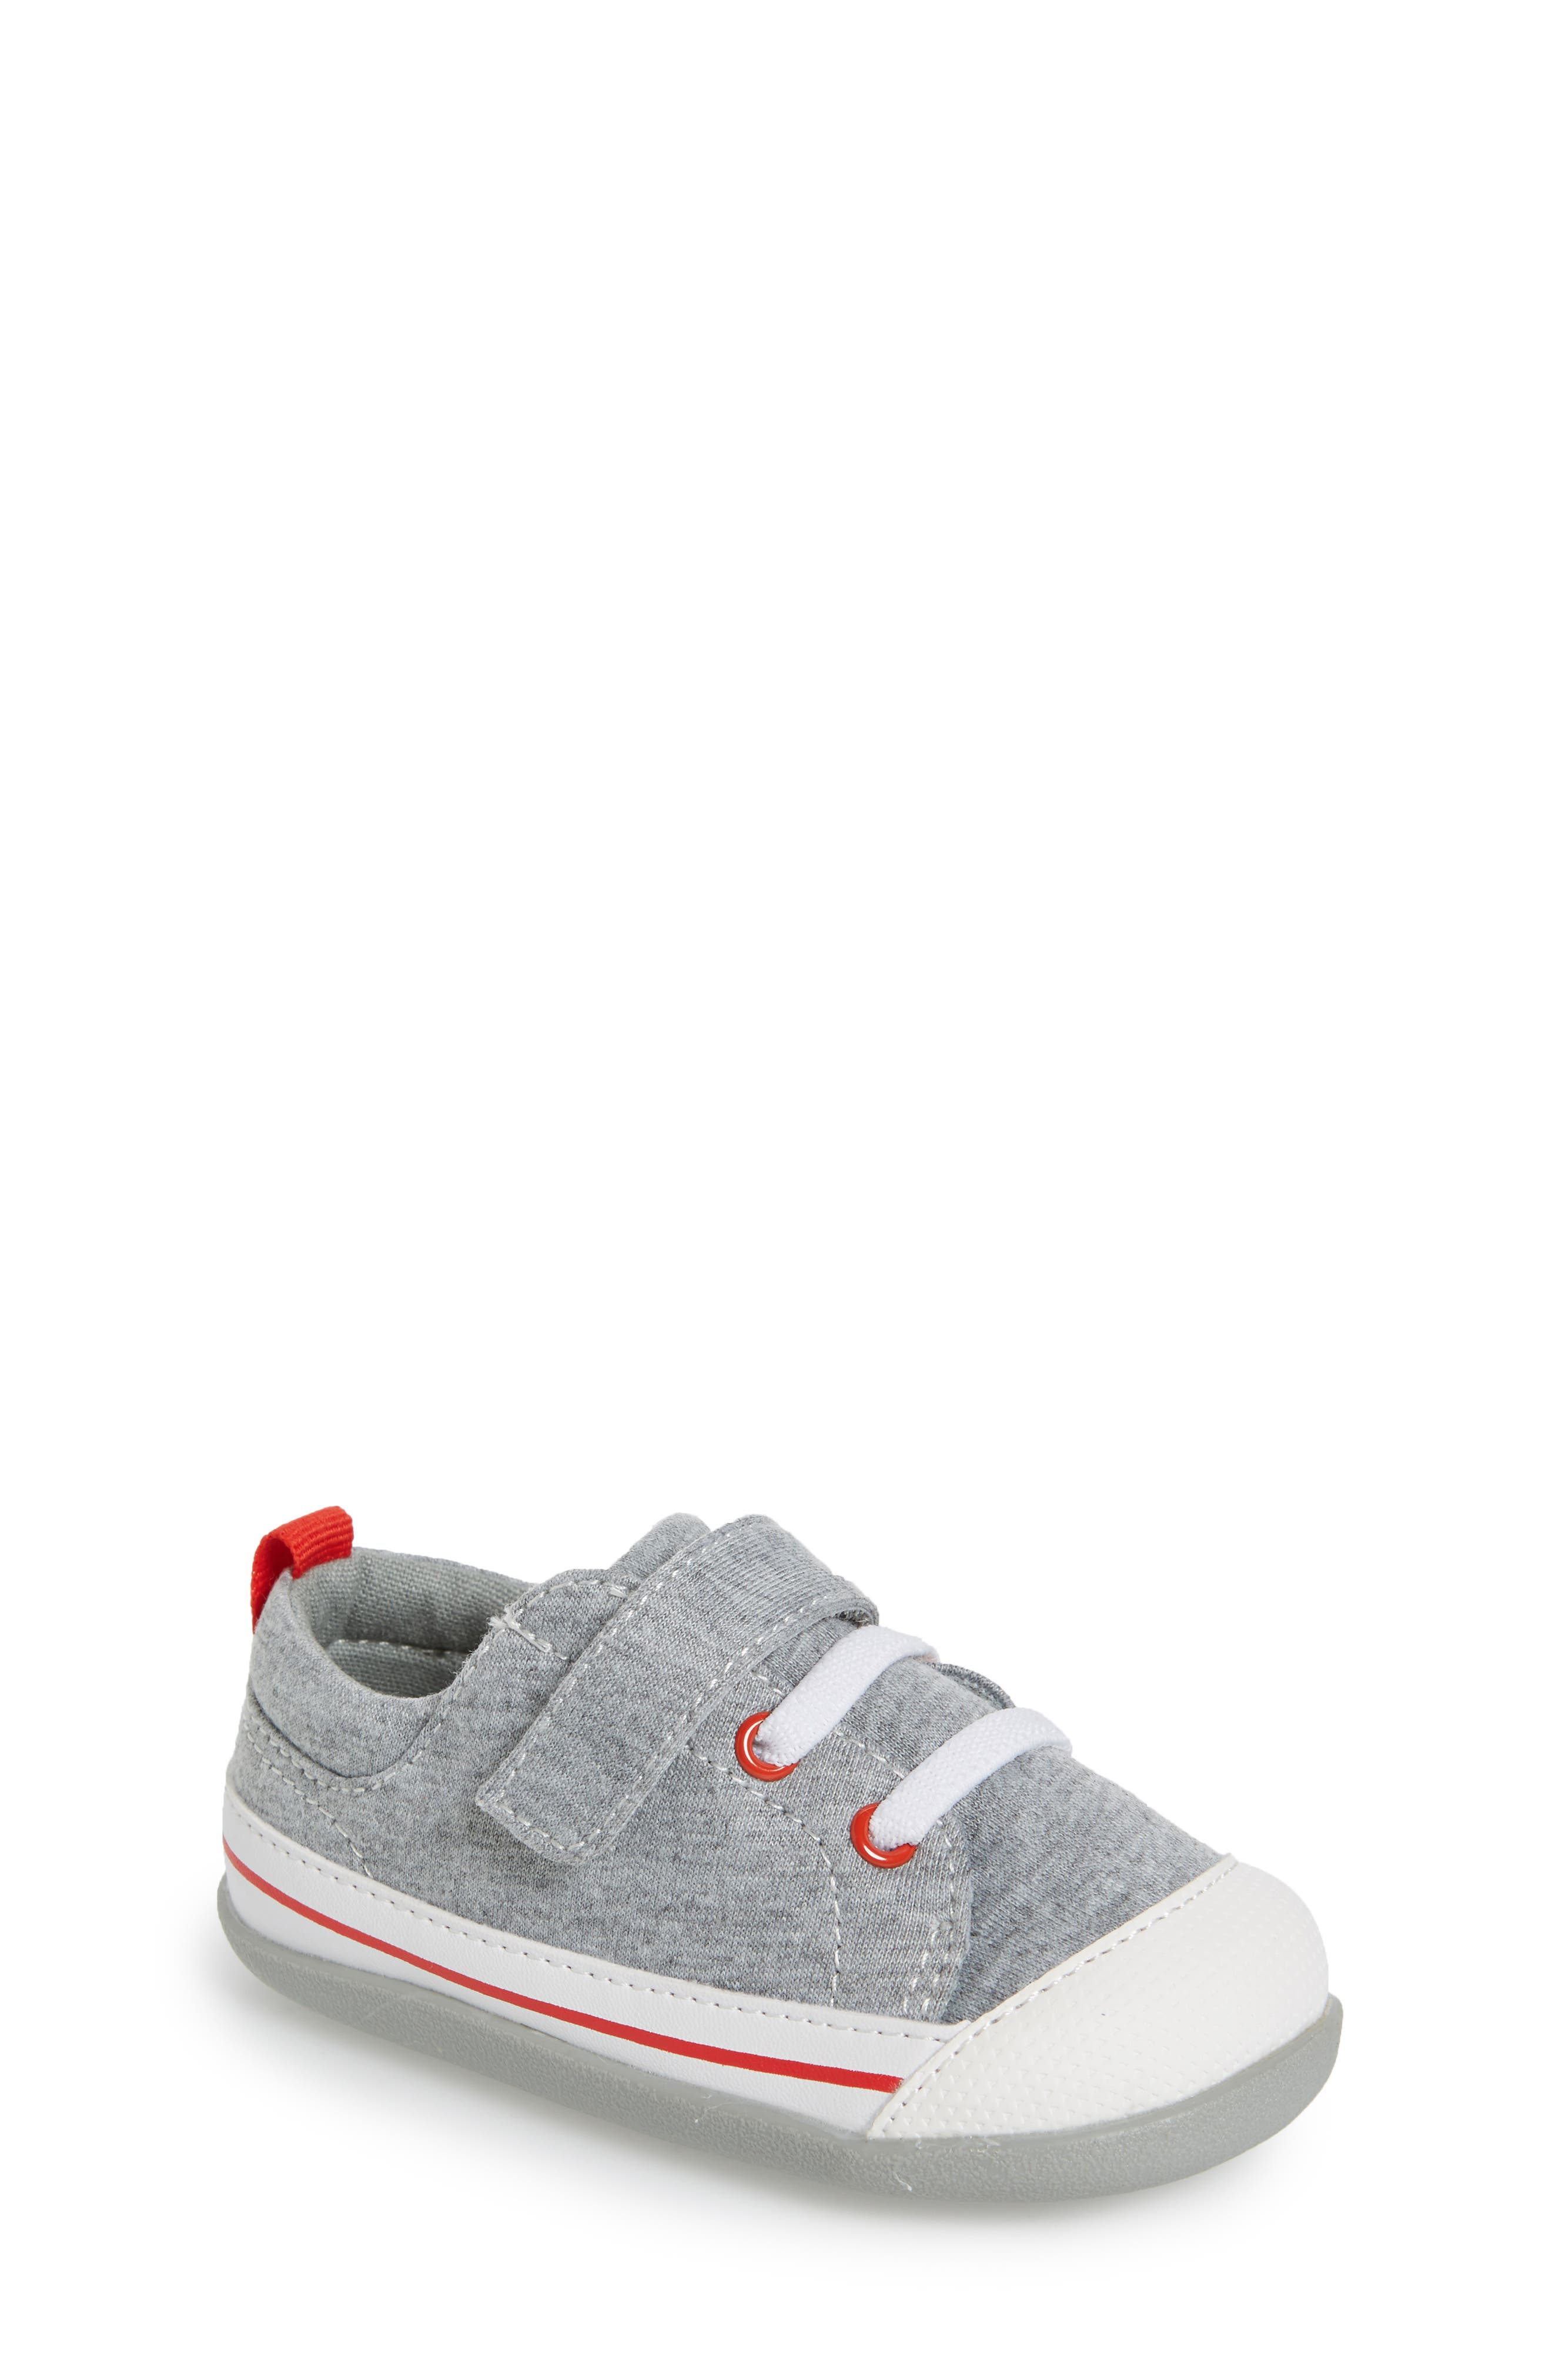 Stevie II Sneaker,                             Main thumbnail 1, color,                             021